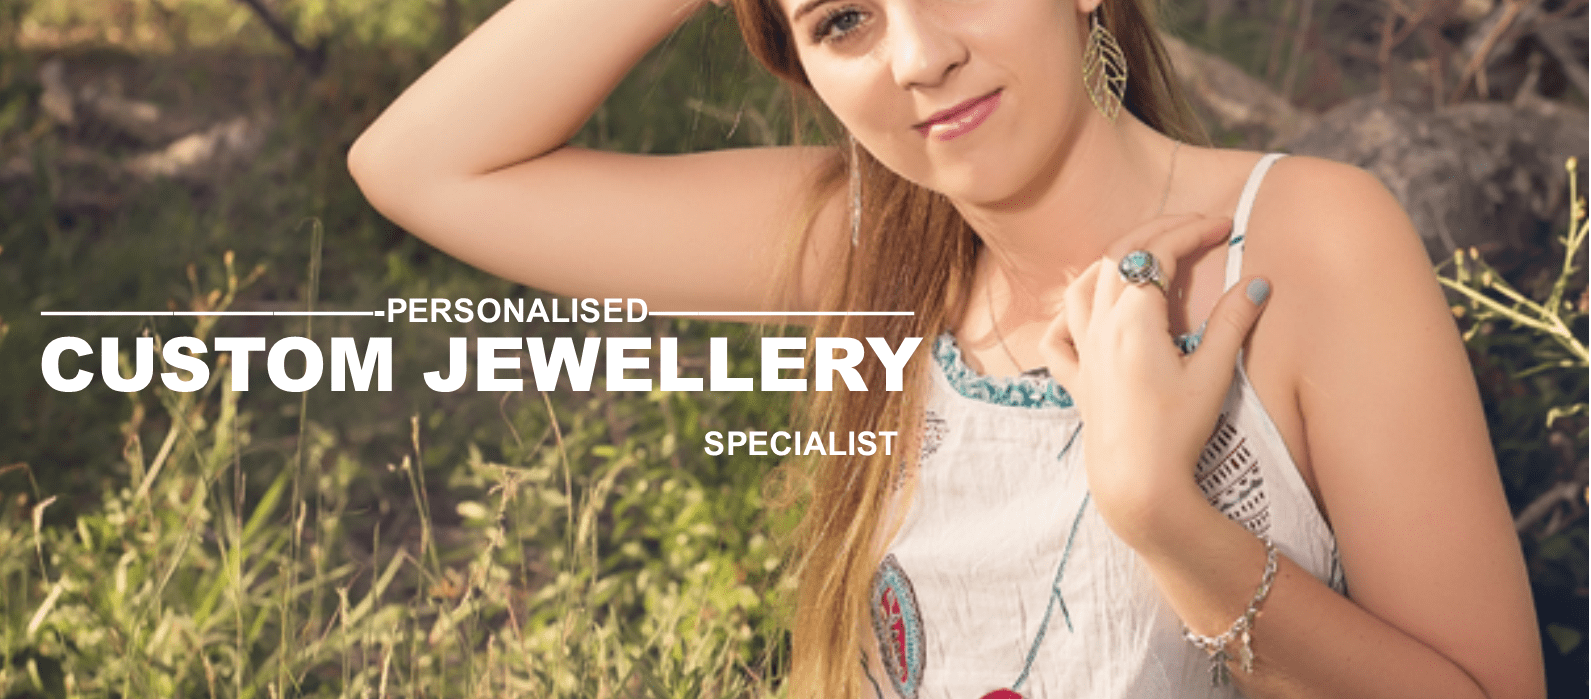 Sweet Jewellery